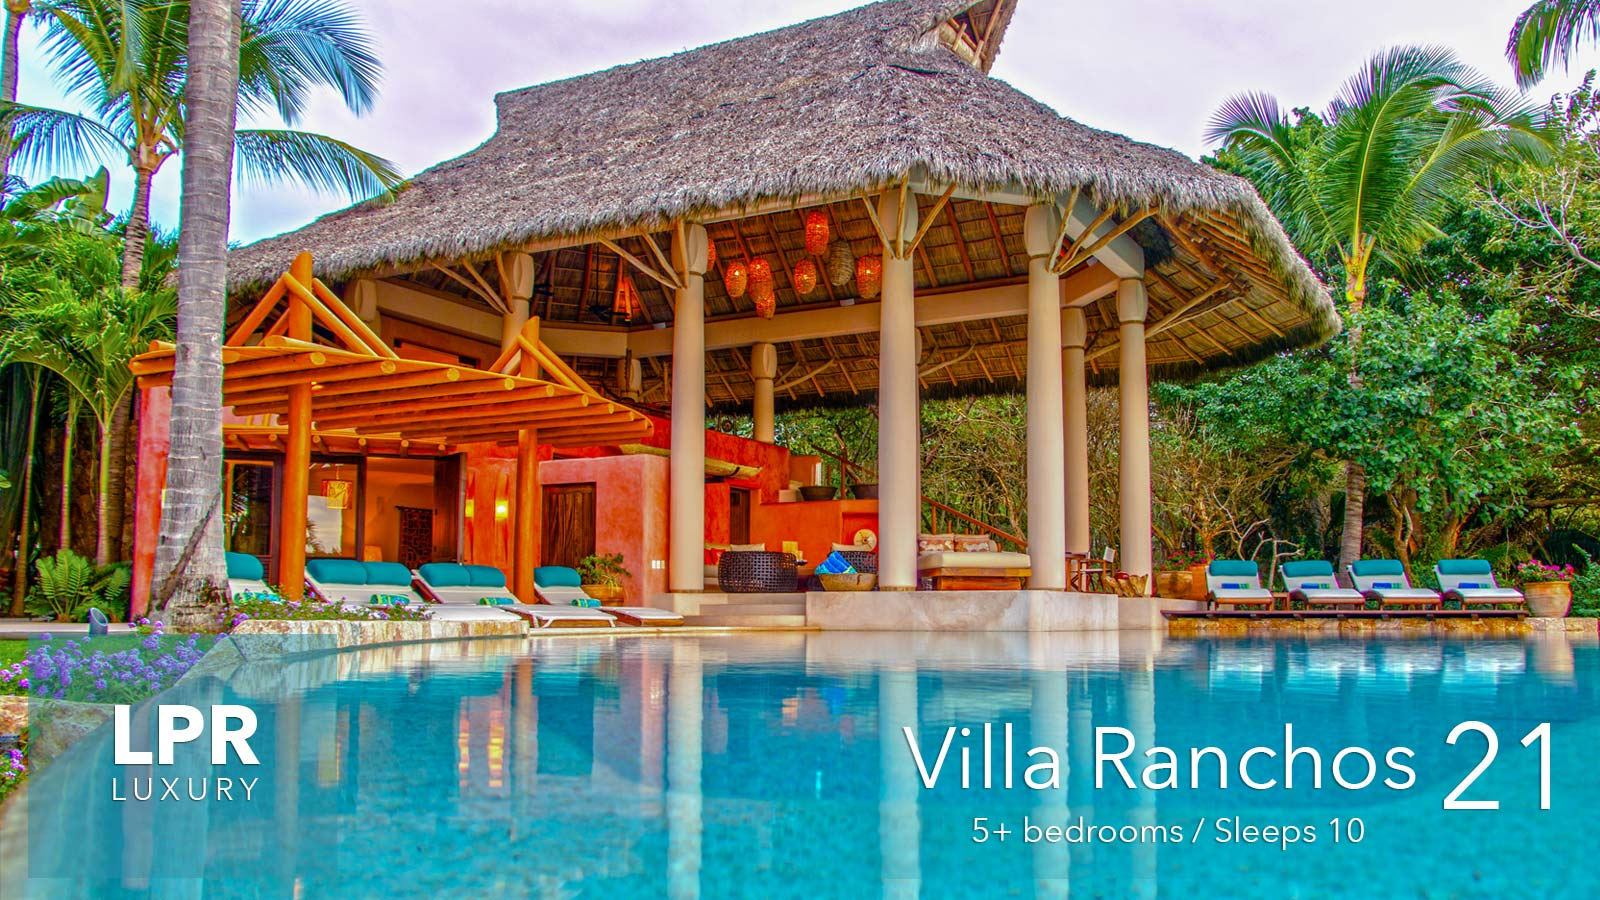 Villa Ranchos 21 - on the exquisitely private Ranchos beach at the Punta Mita Resort, Riviera Nayarit, Mexico